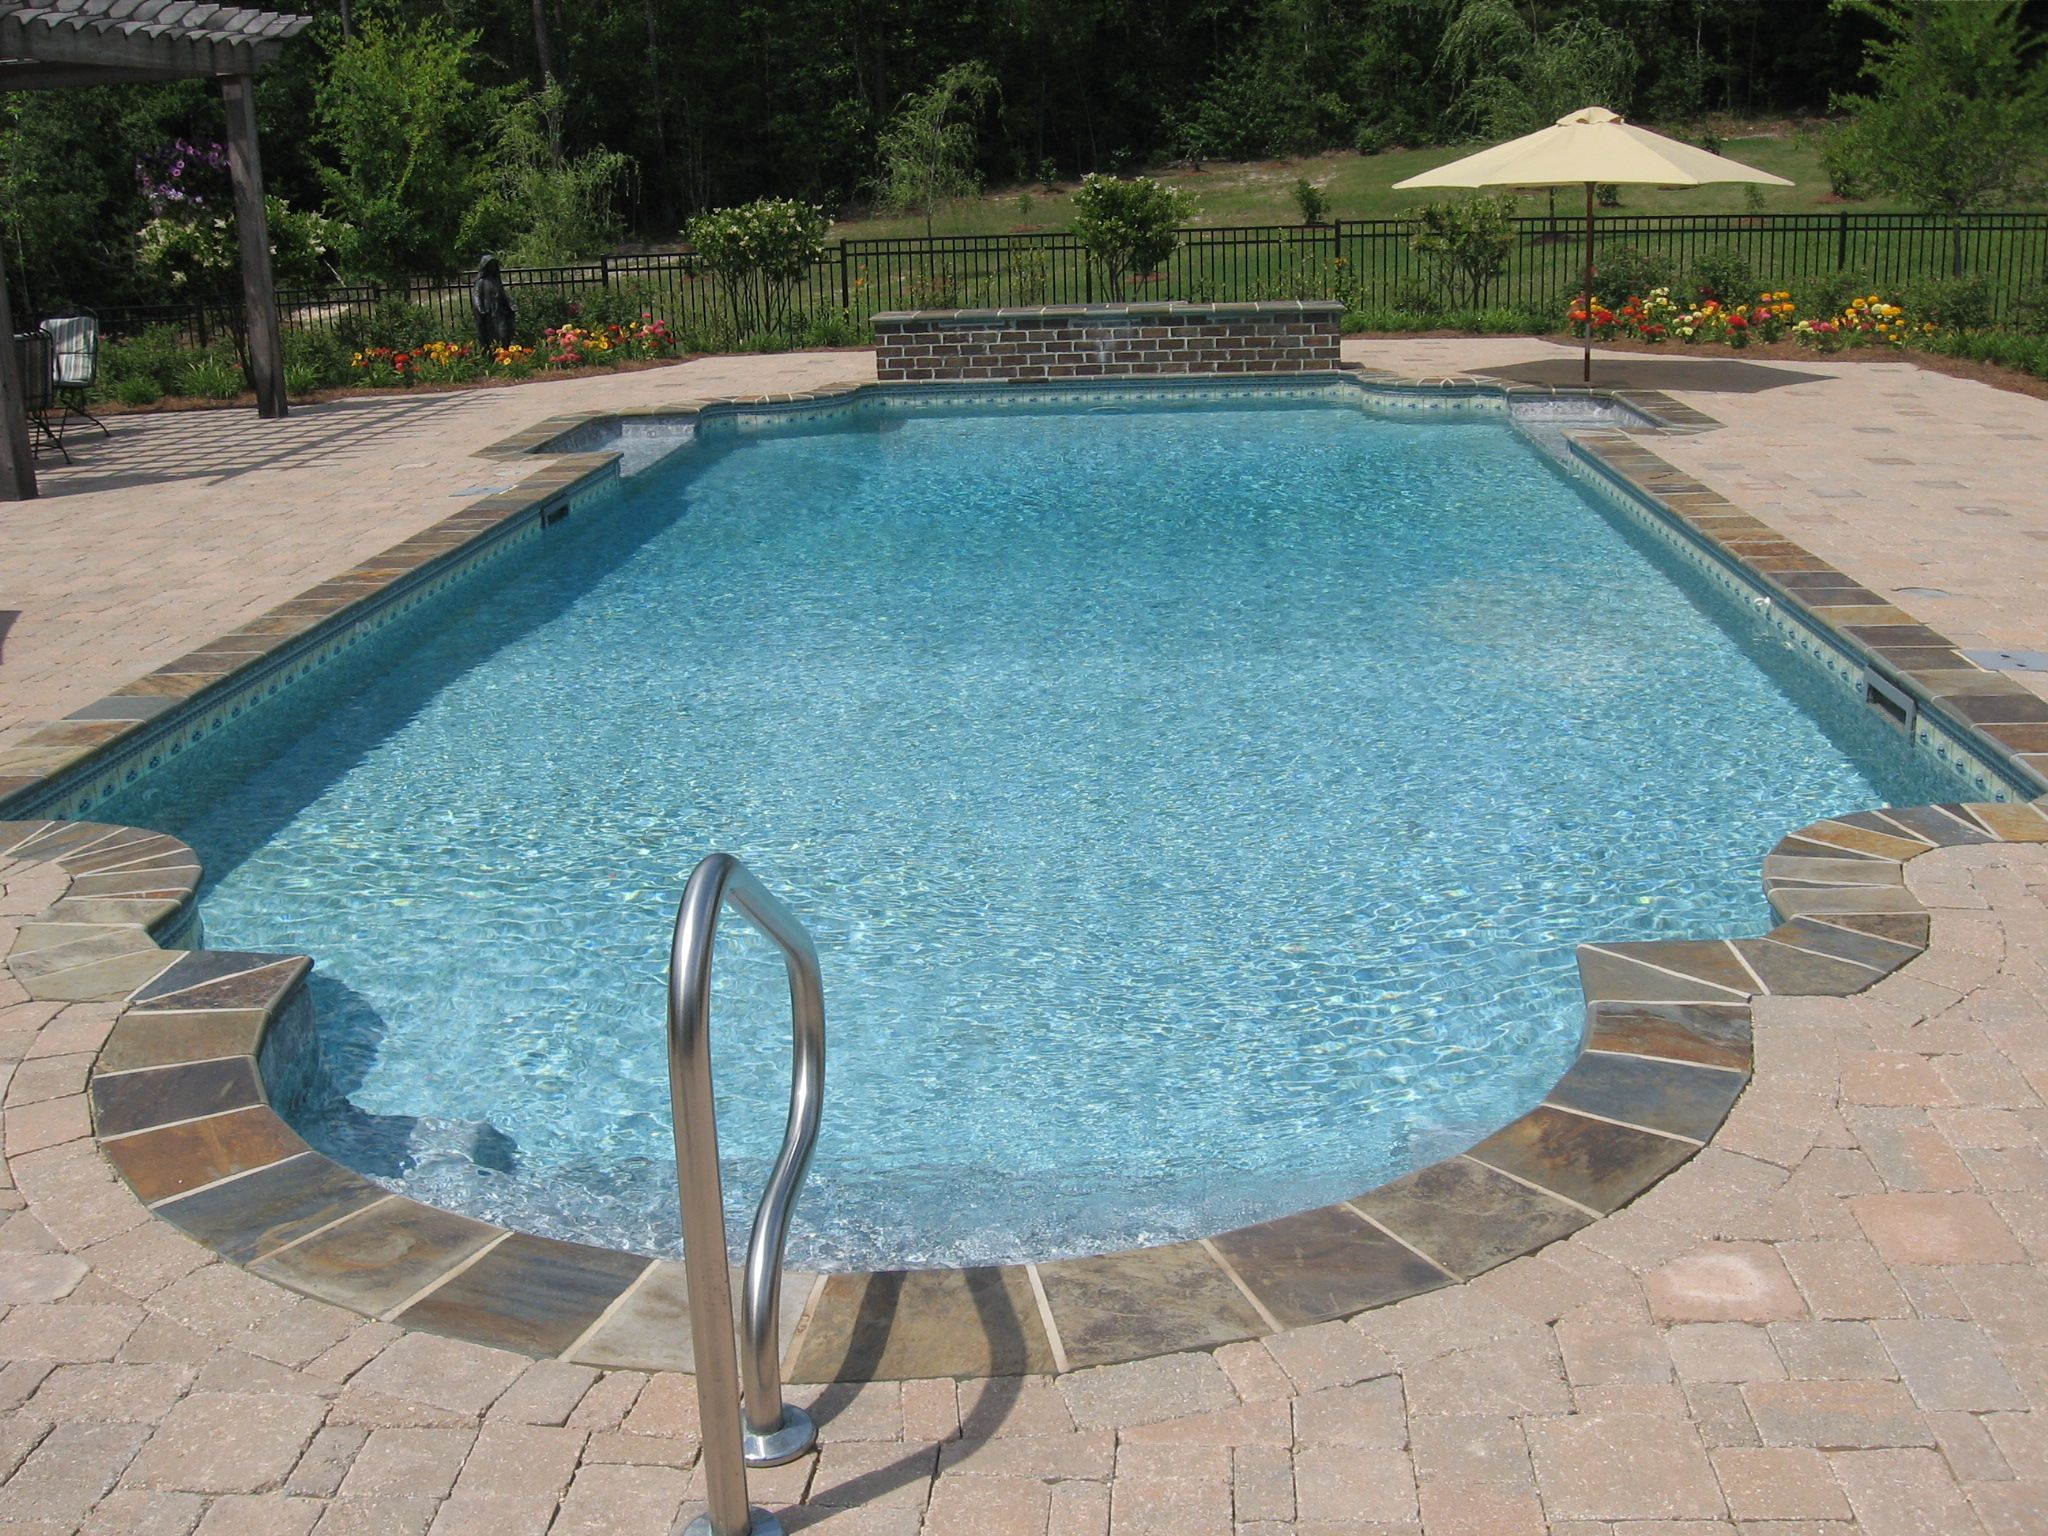 Backyard fun swimming pool ideas pool houses pinterest Backyard swimming pools